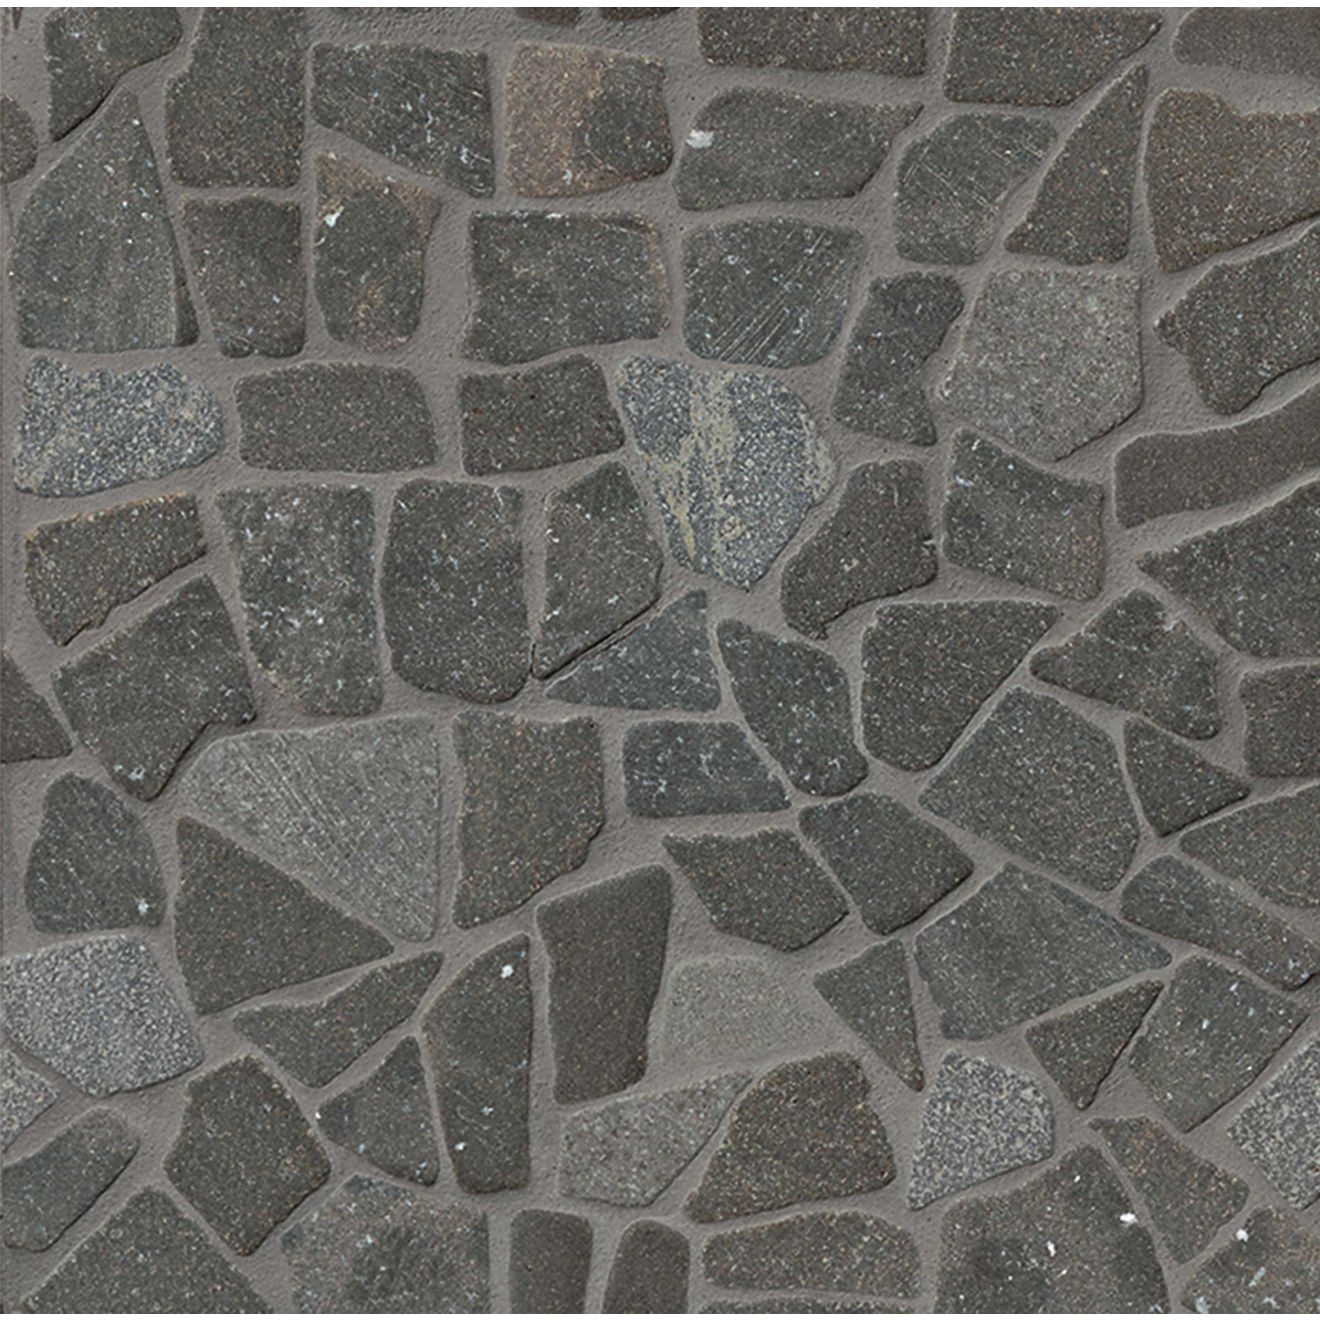 Hemisphere Crazy Random Square Interlocking Mosaic in Black Lava